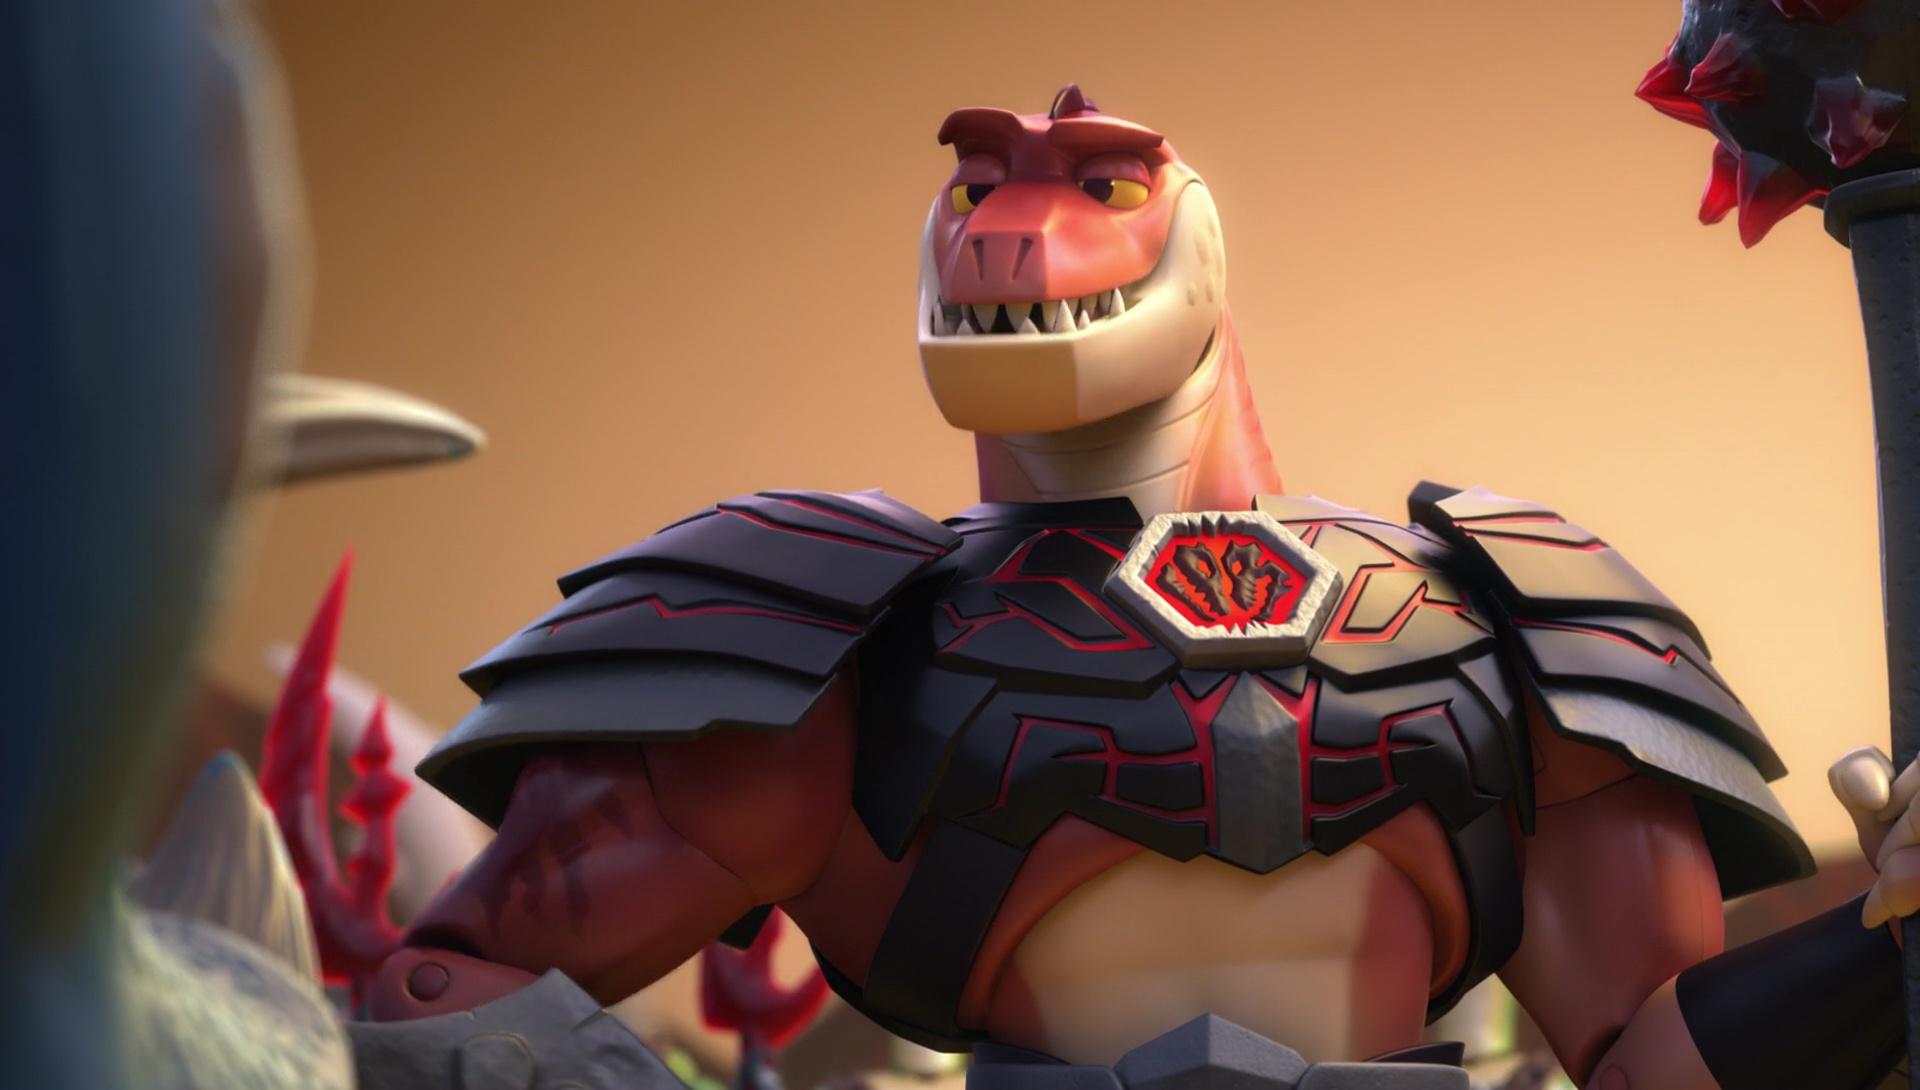 reptillus-maximus-personnage-toy-story-hors-du-temps-02